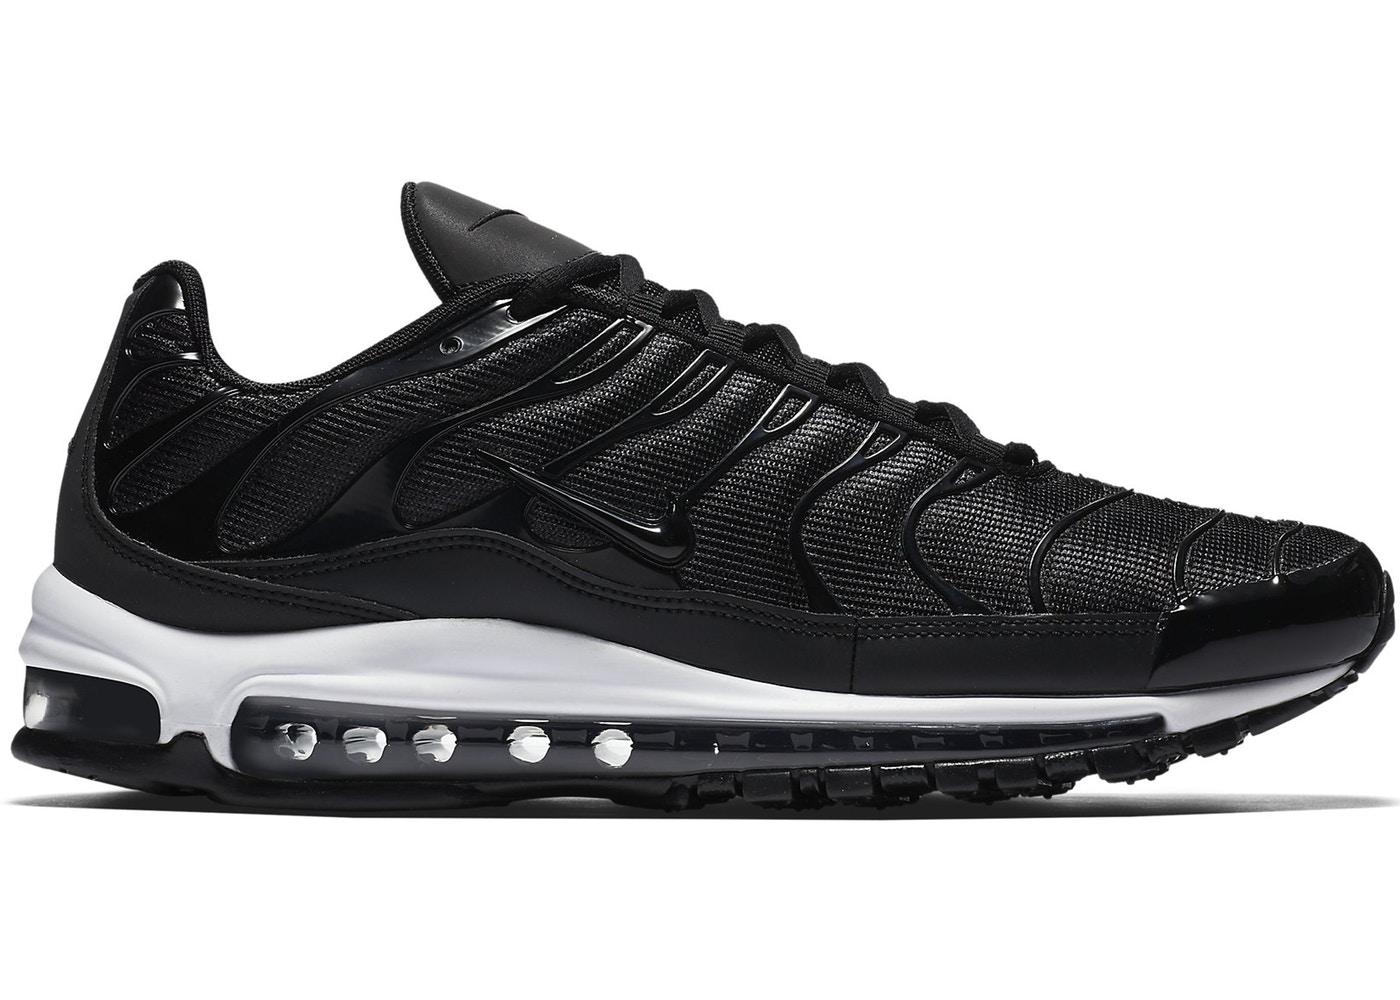 On Sale: Nike Air Max 97 Plus